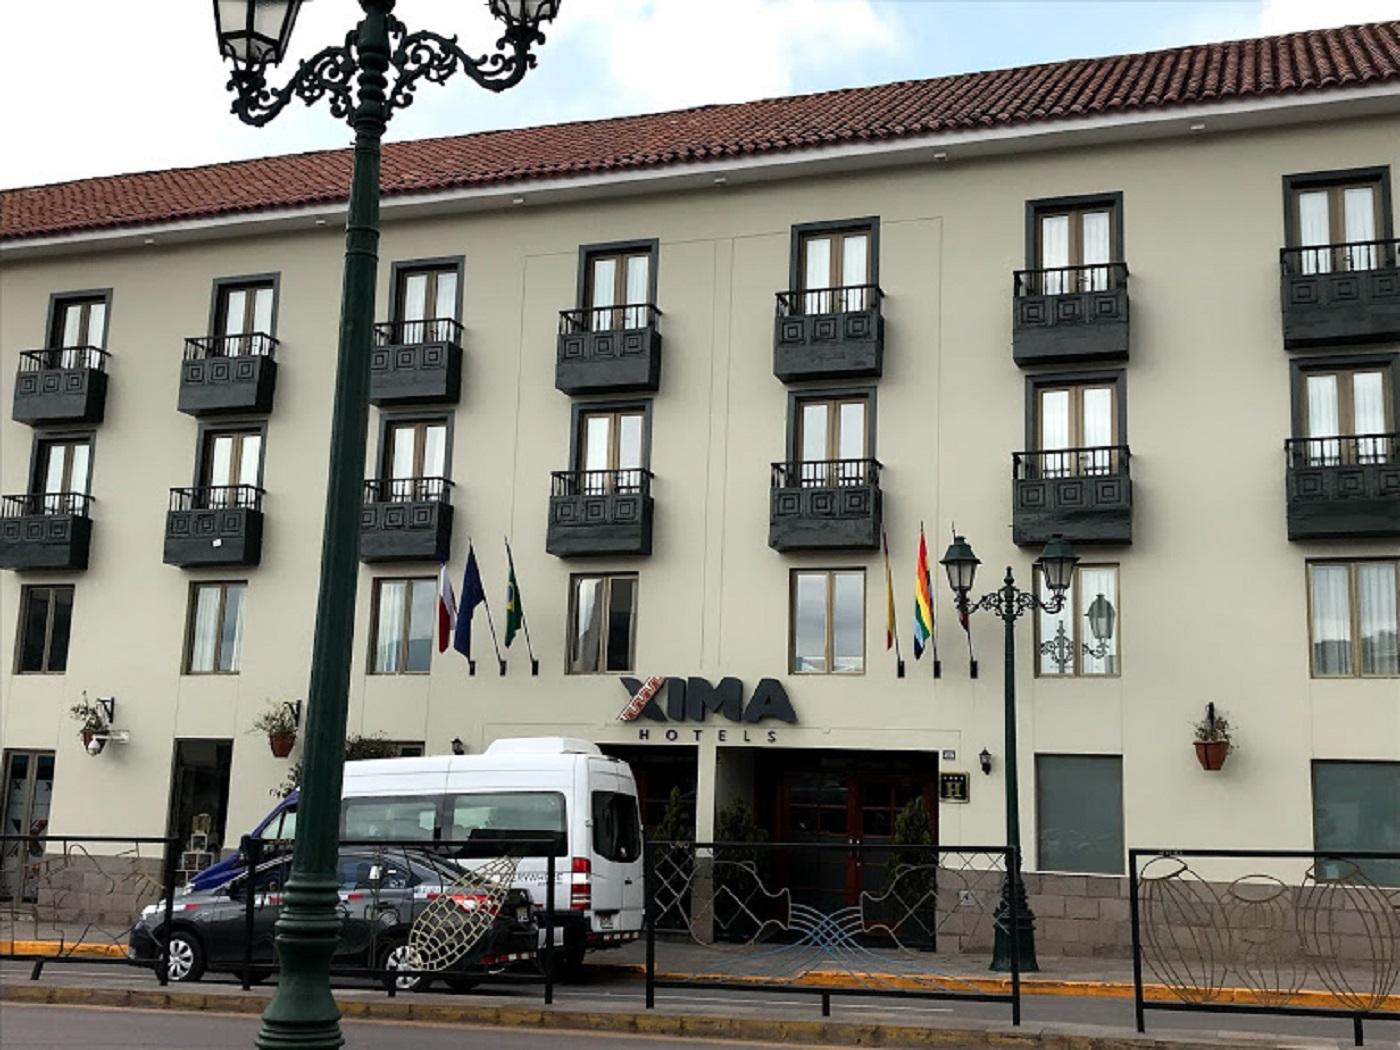 Xima Cusco Hotel (Foto: Tati Sisti)